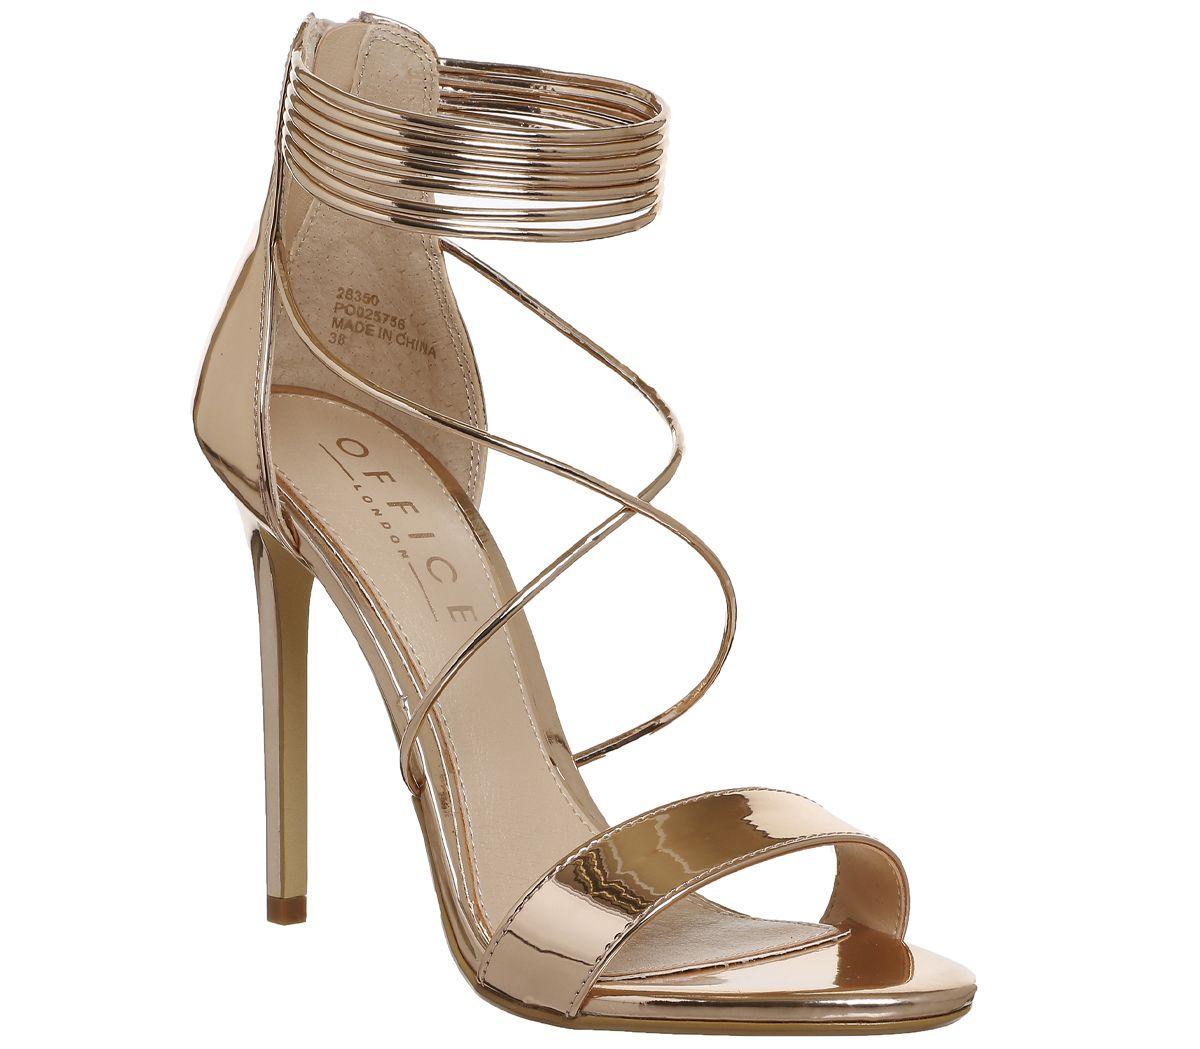 d02aab5cc9 Office Hollywood Tubular Strap Sandals Rose Gold Mirror - High Heels